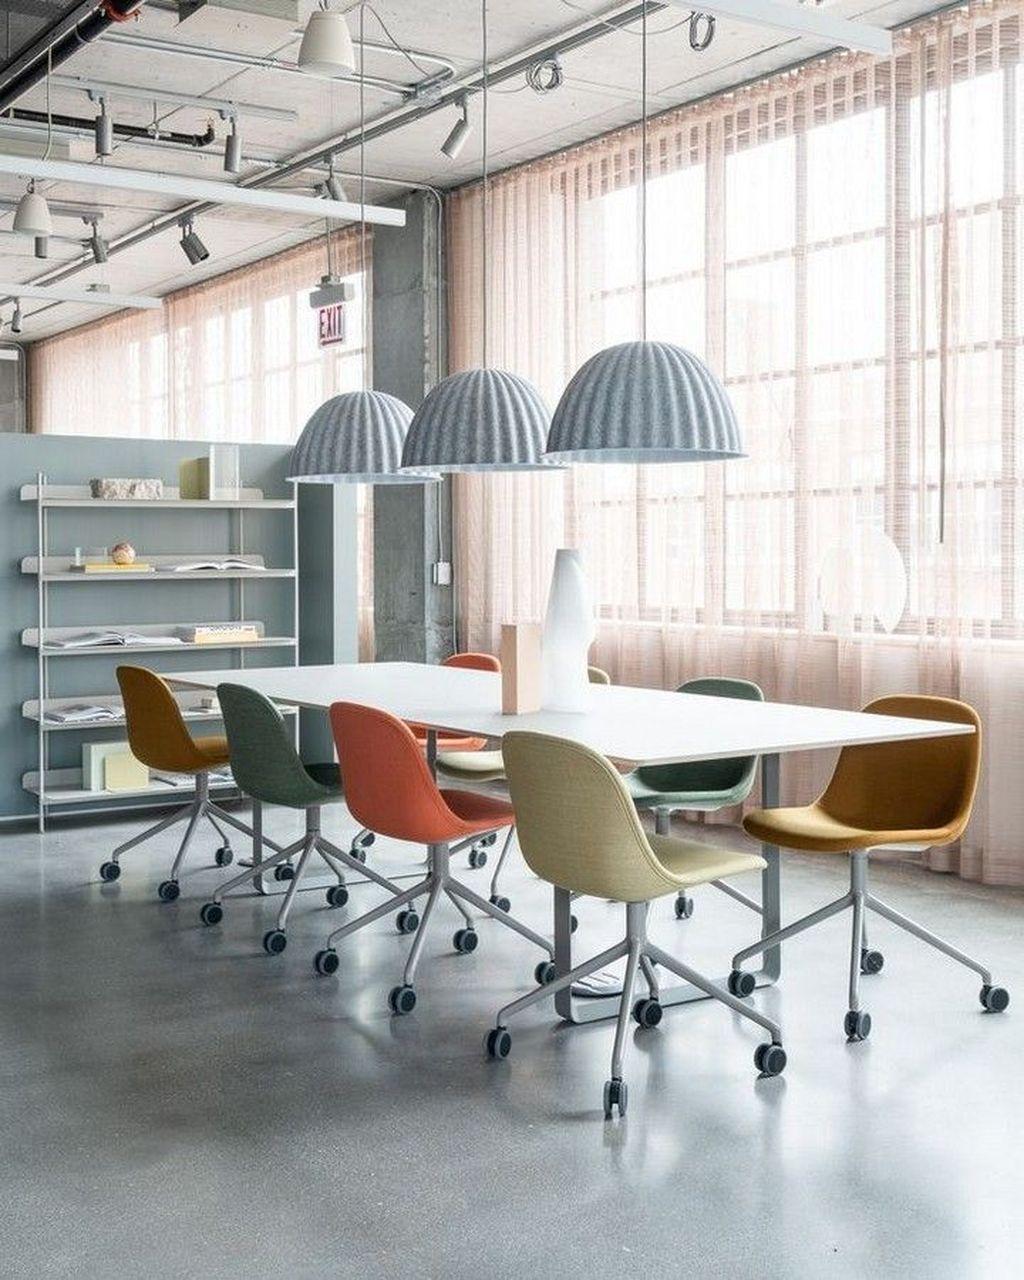 Gorgeous Modern Office Interior Design Ideas You Never Seen Before 22